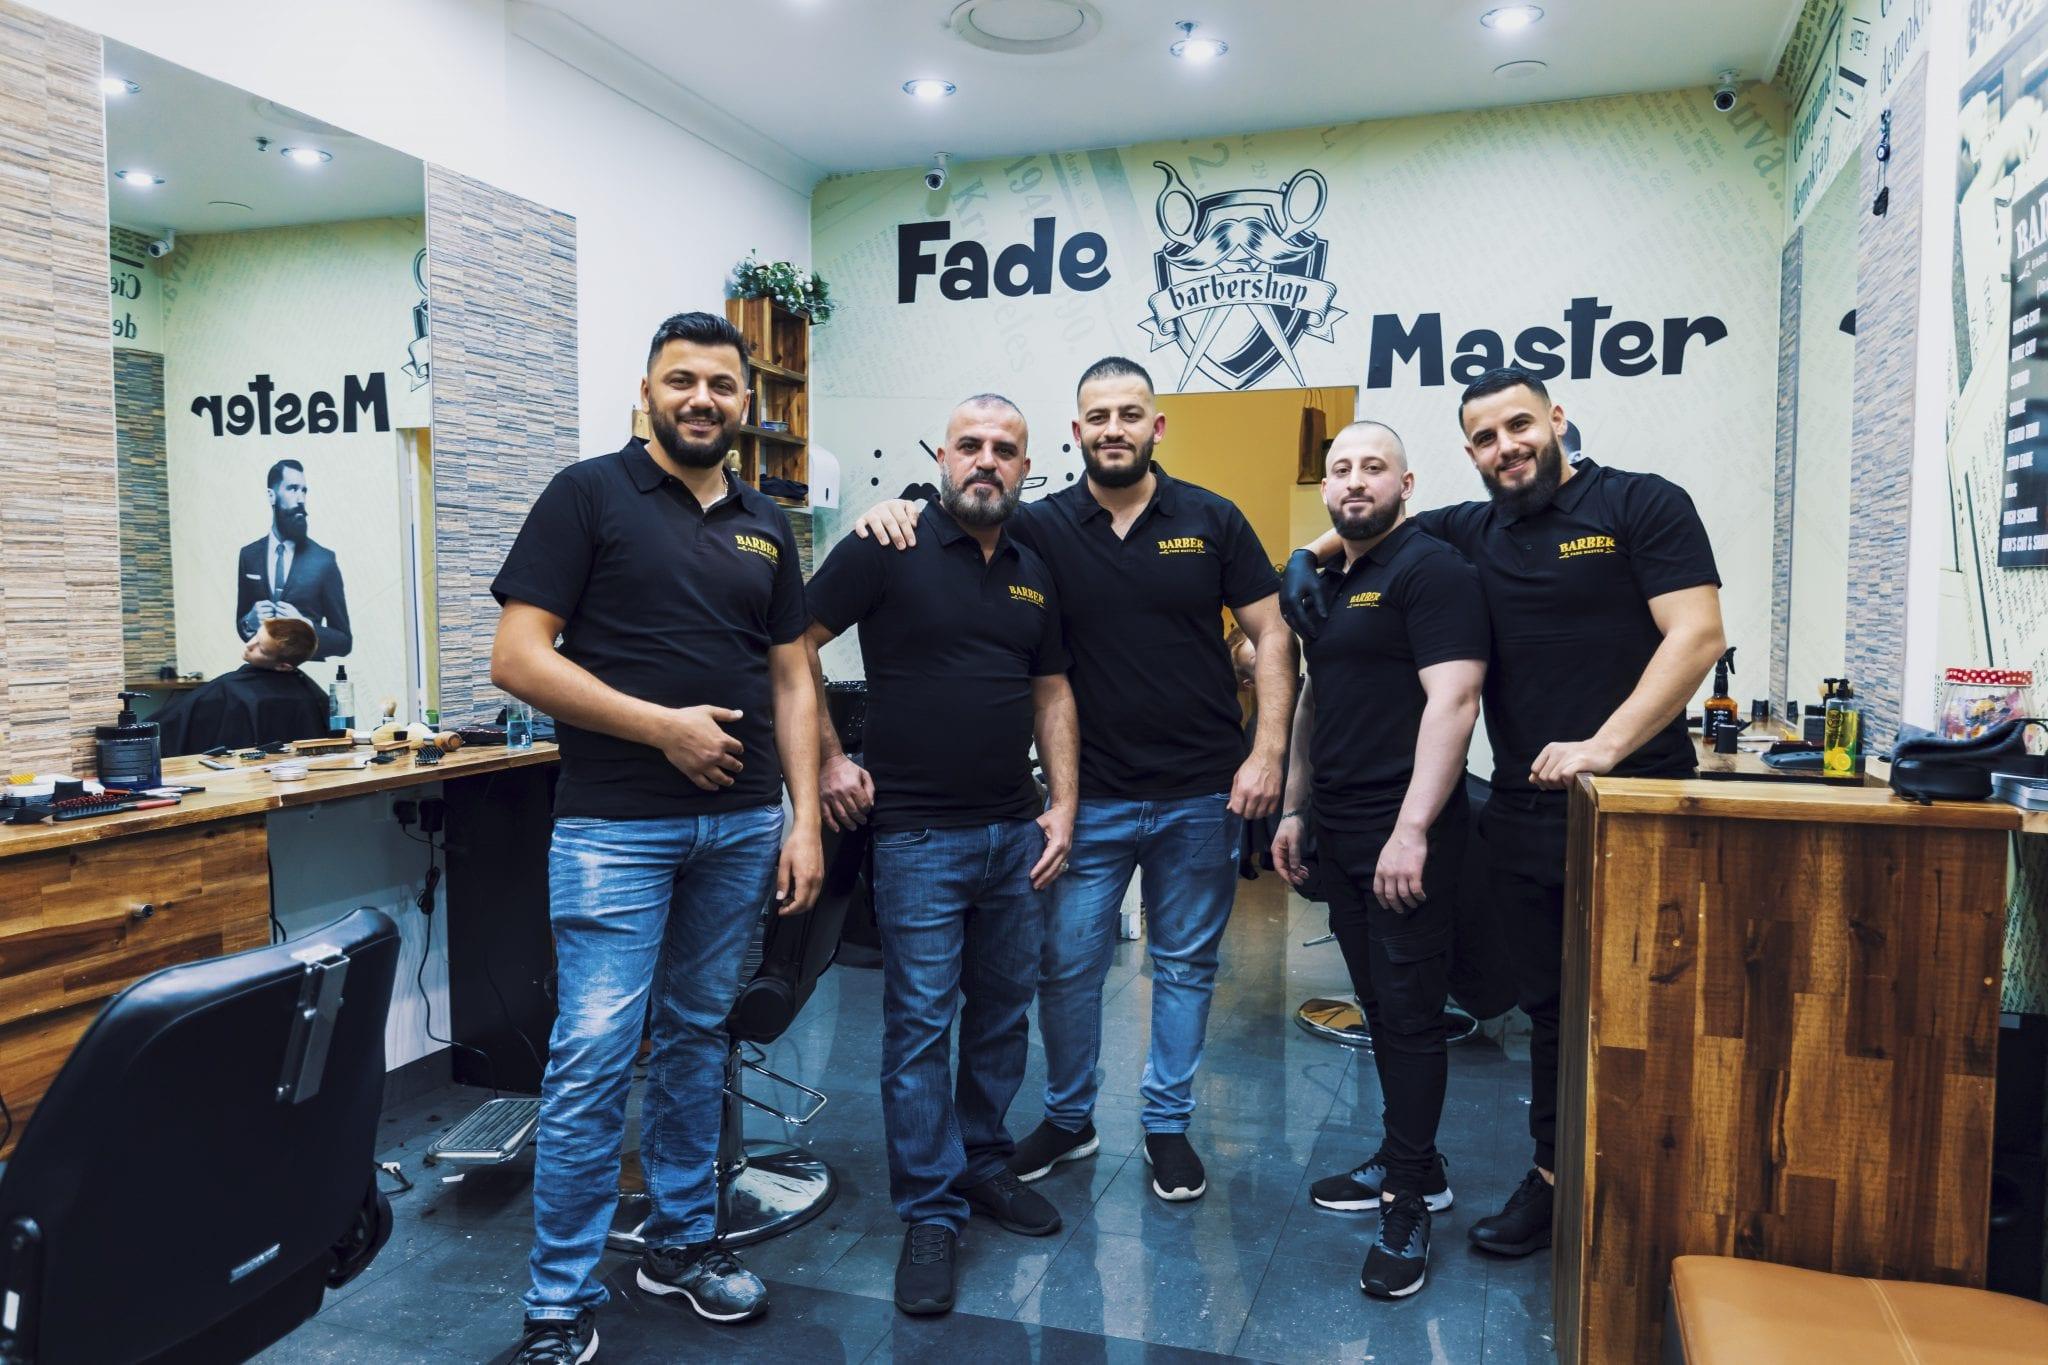 Fade Master Barber